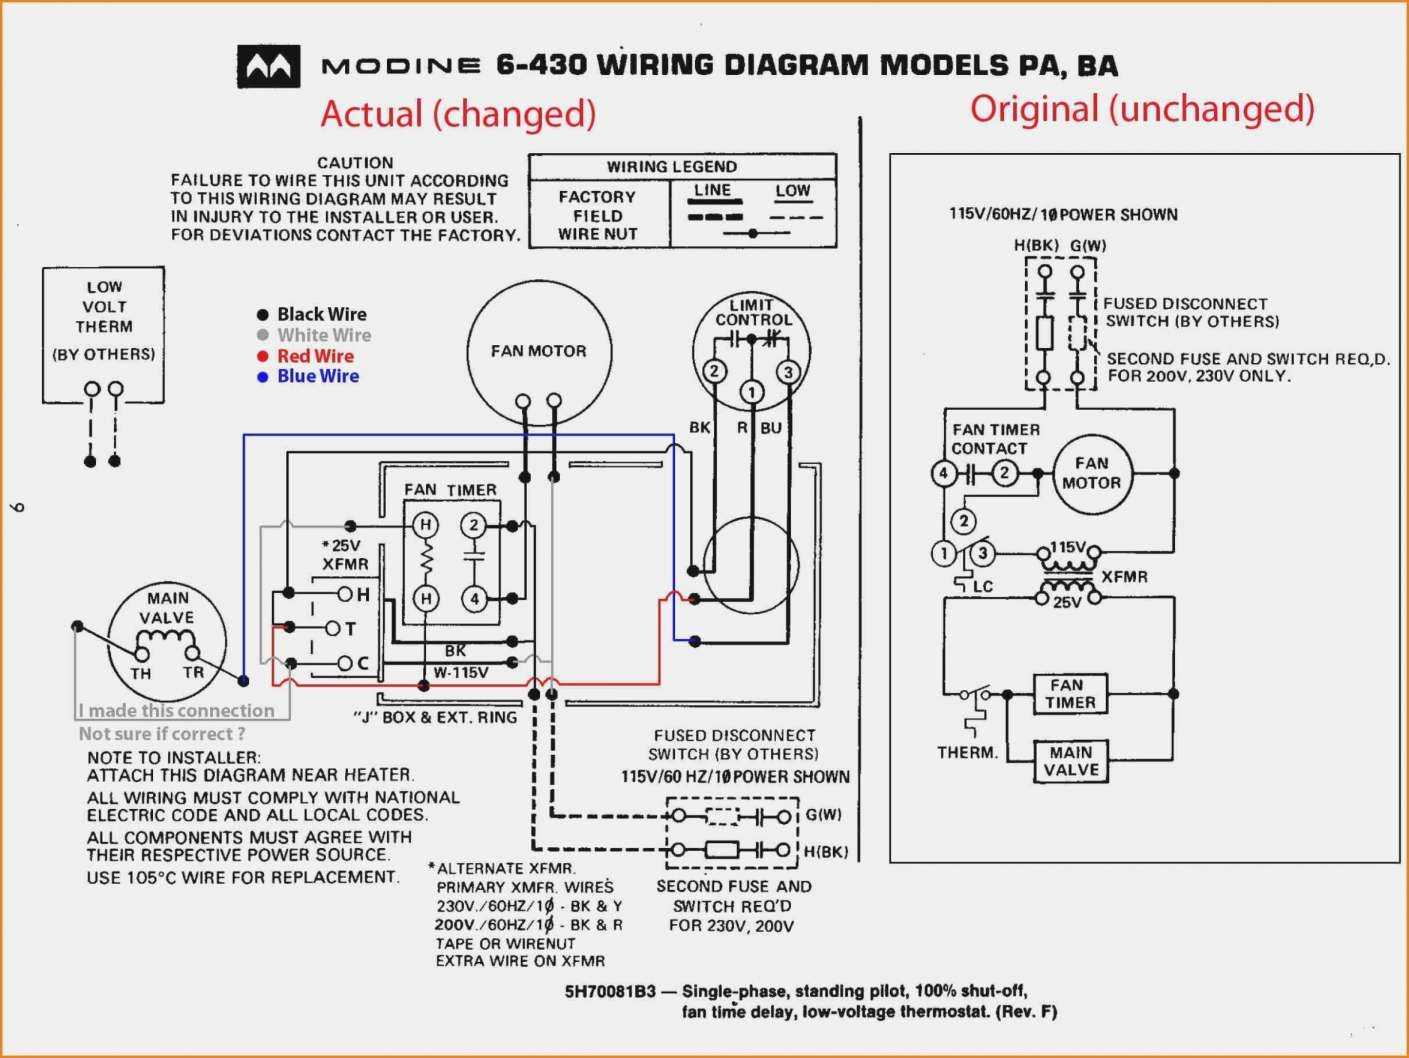 10 General Electric Motor 5kc Wiring Diagram Wiring Diagram In 2020 With Images Electrical Wiring Diagram Diagram Wire